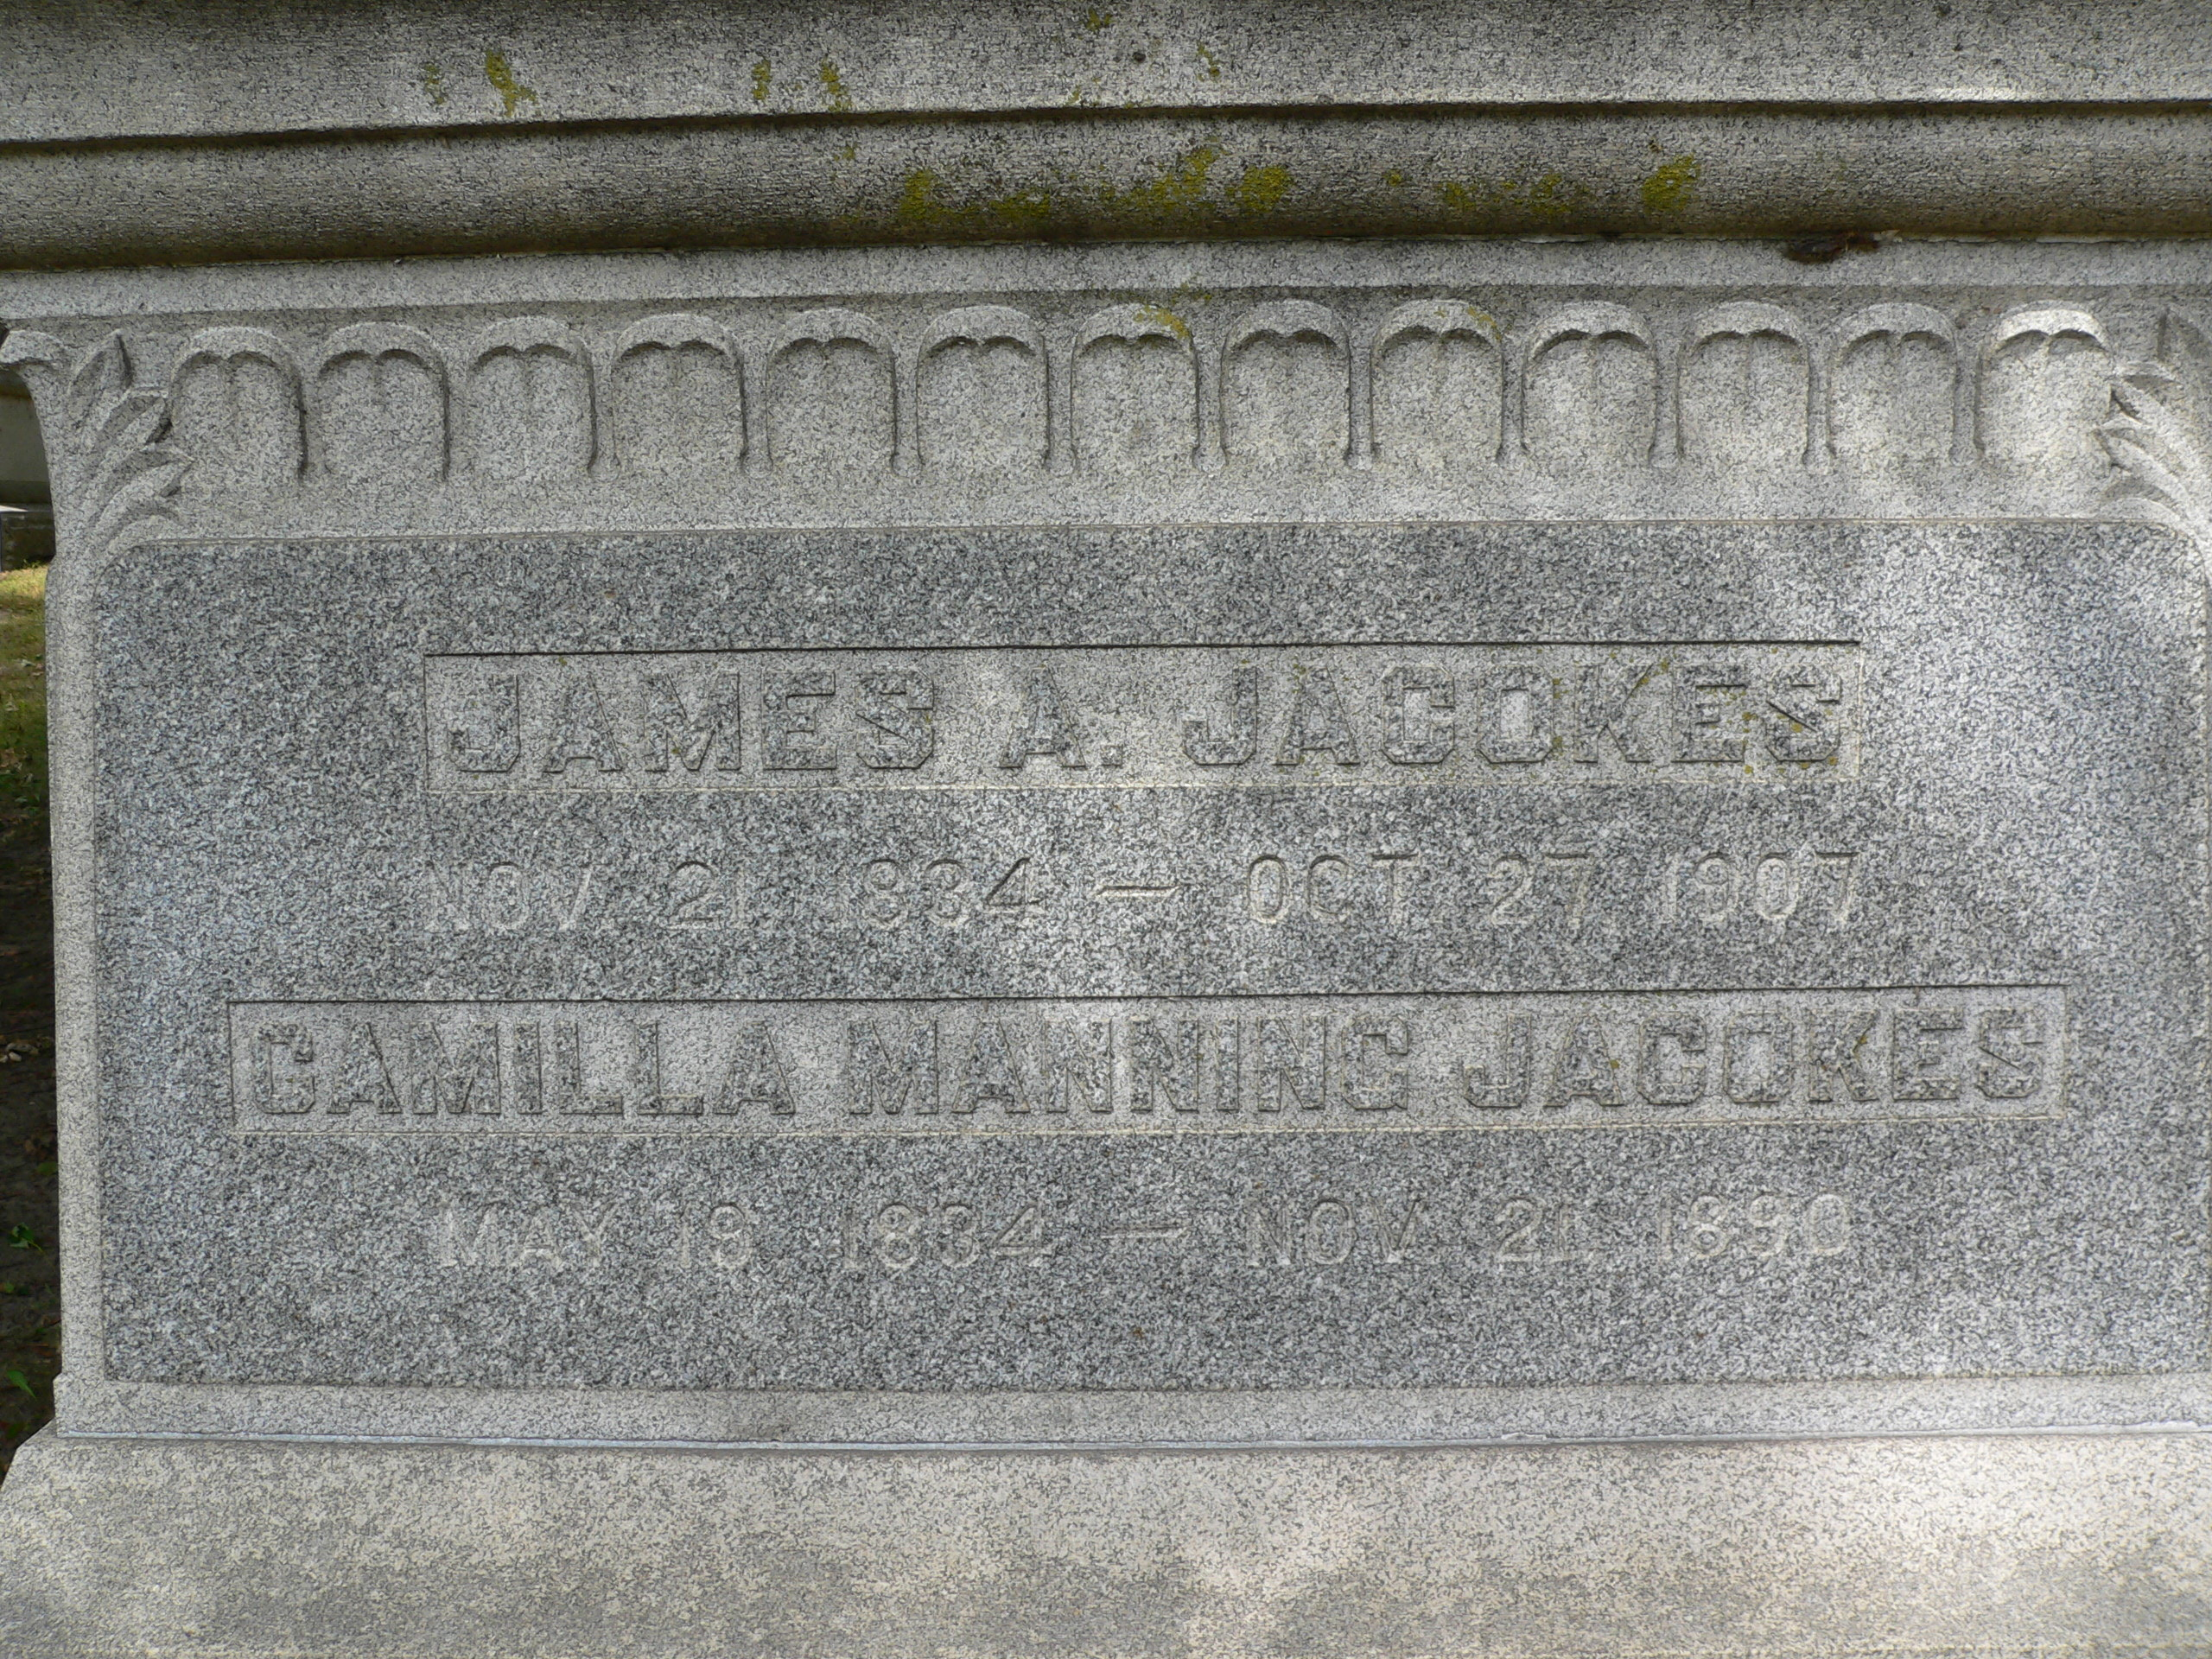 Judge James A. Jacokes